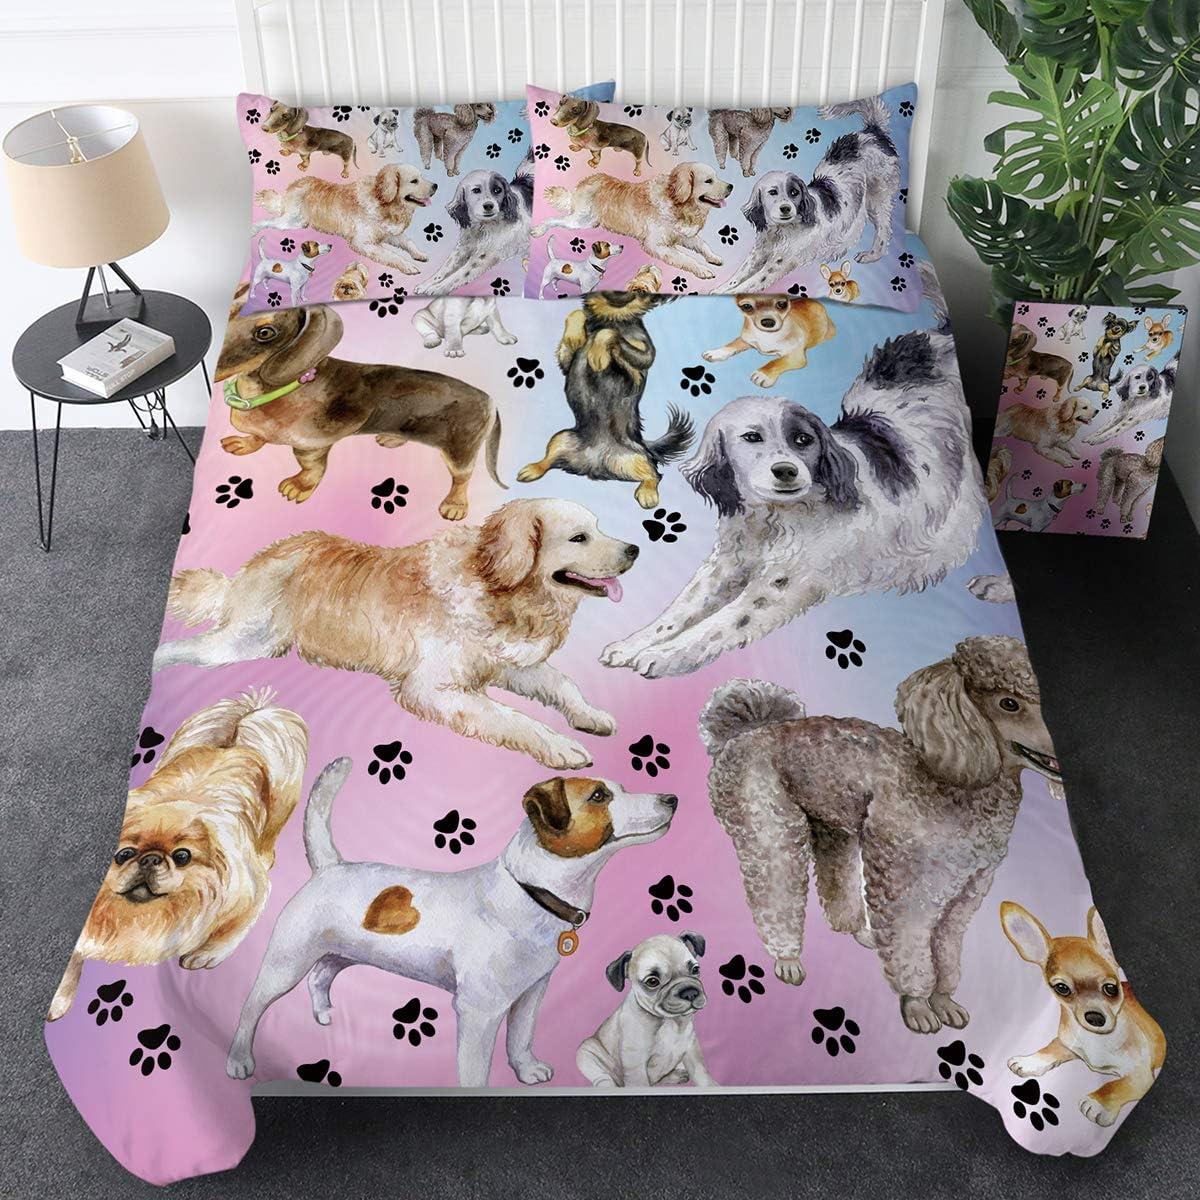 Sleepwish Puppy Dog Bedding Animals Duvet Cover Pieces 3 Com Set Ranking TOP19 discount